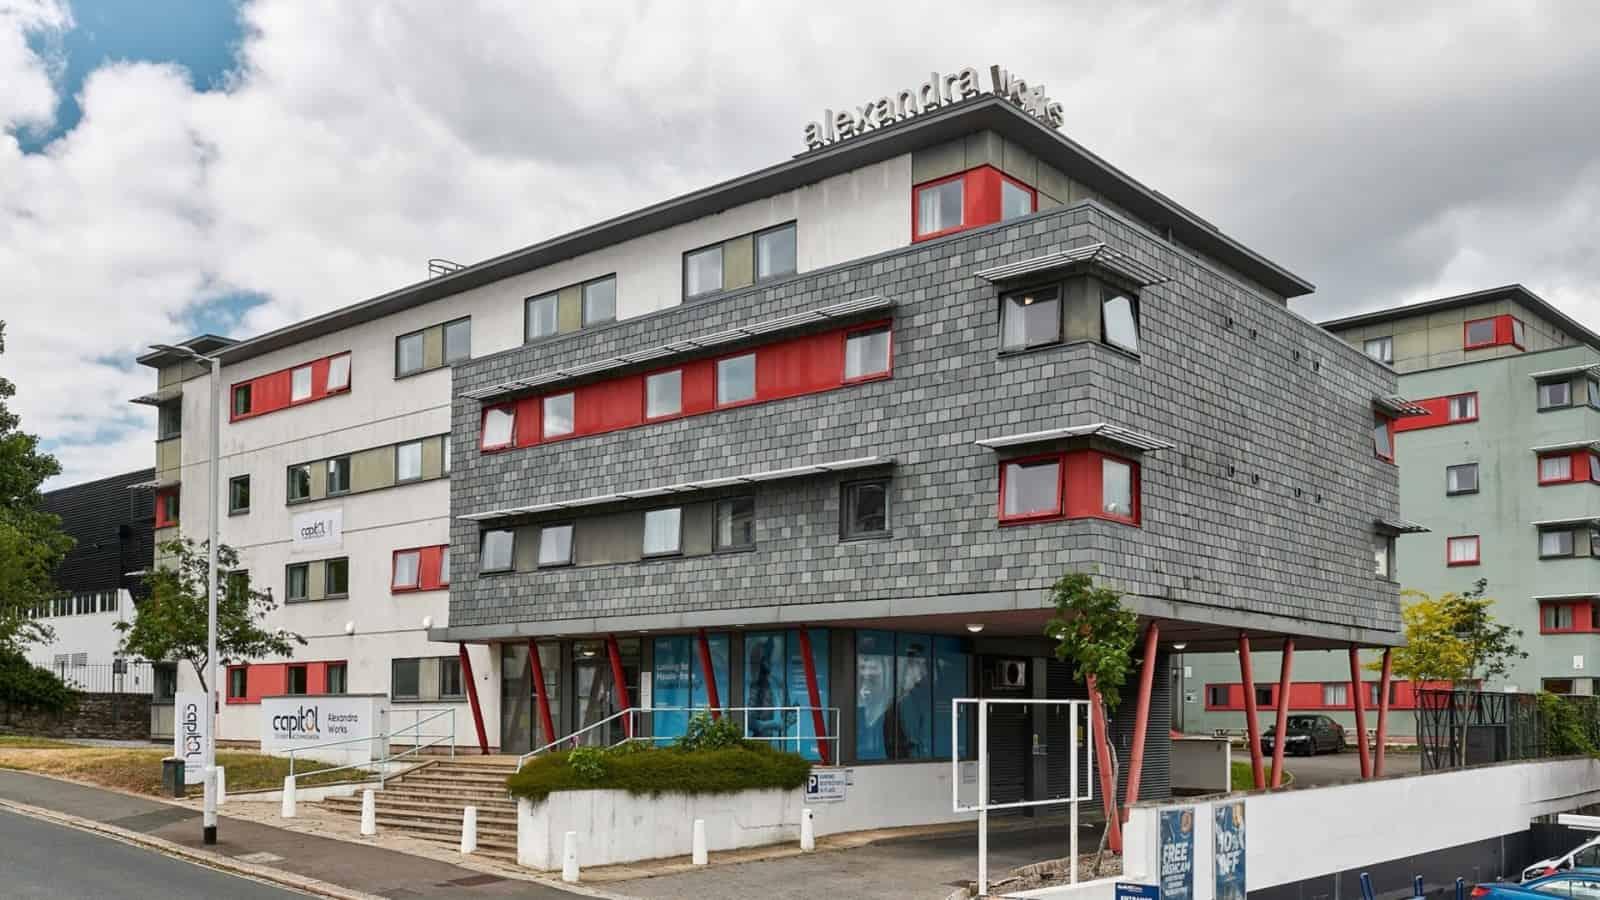 alexandra works summer accommodation